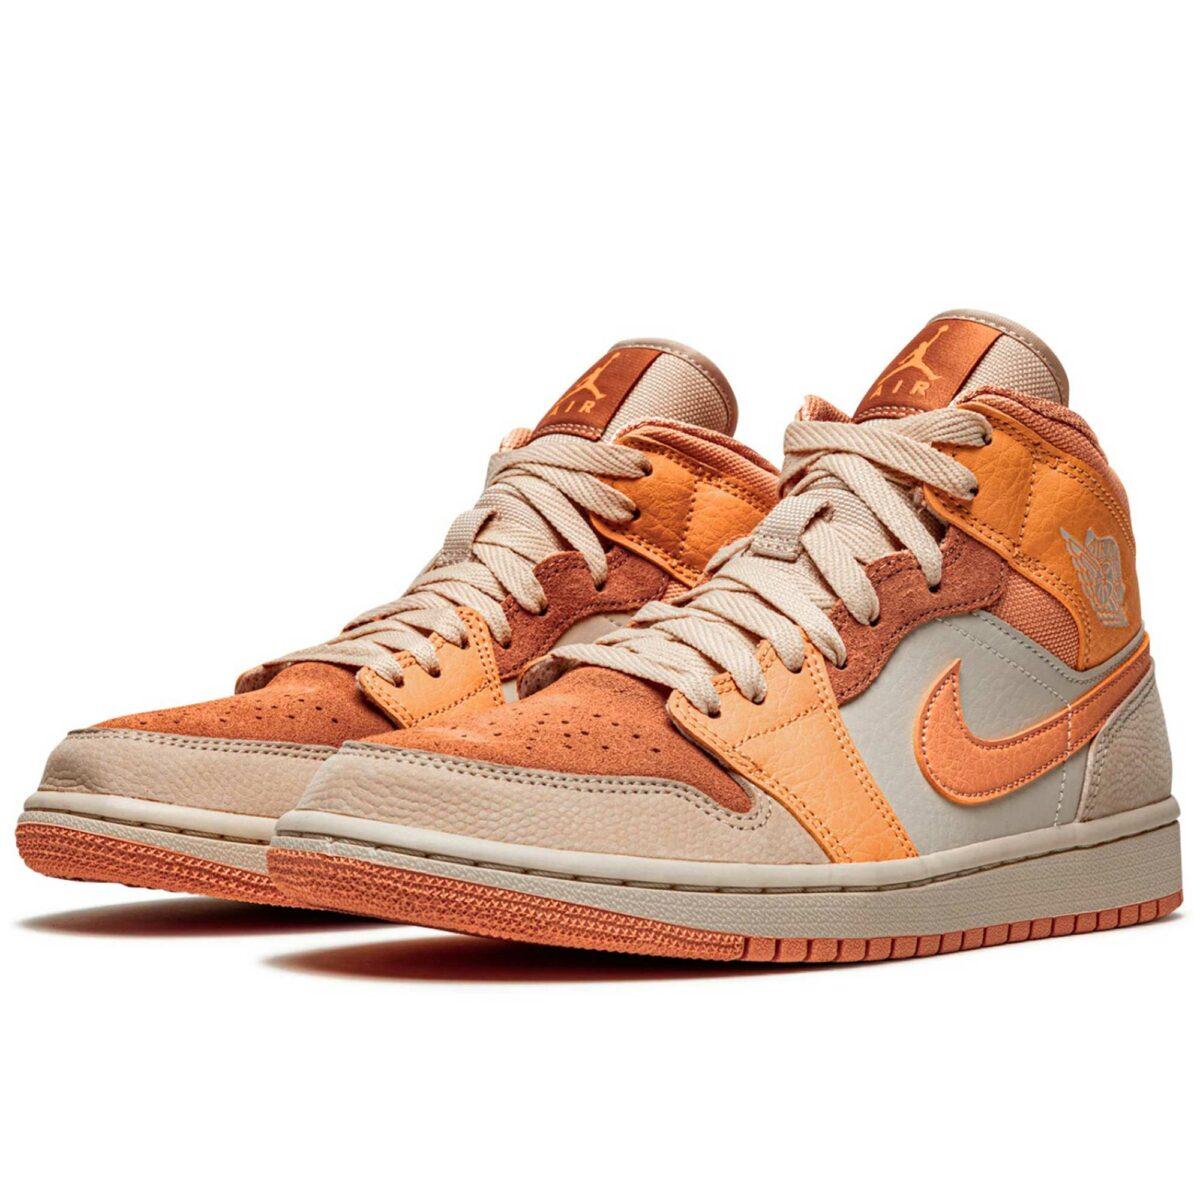 nike air Jordan 1 mid apricot DH4270_800 купить